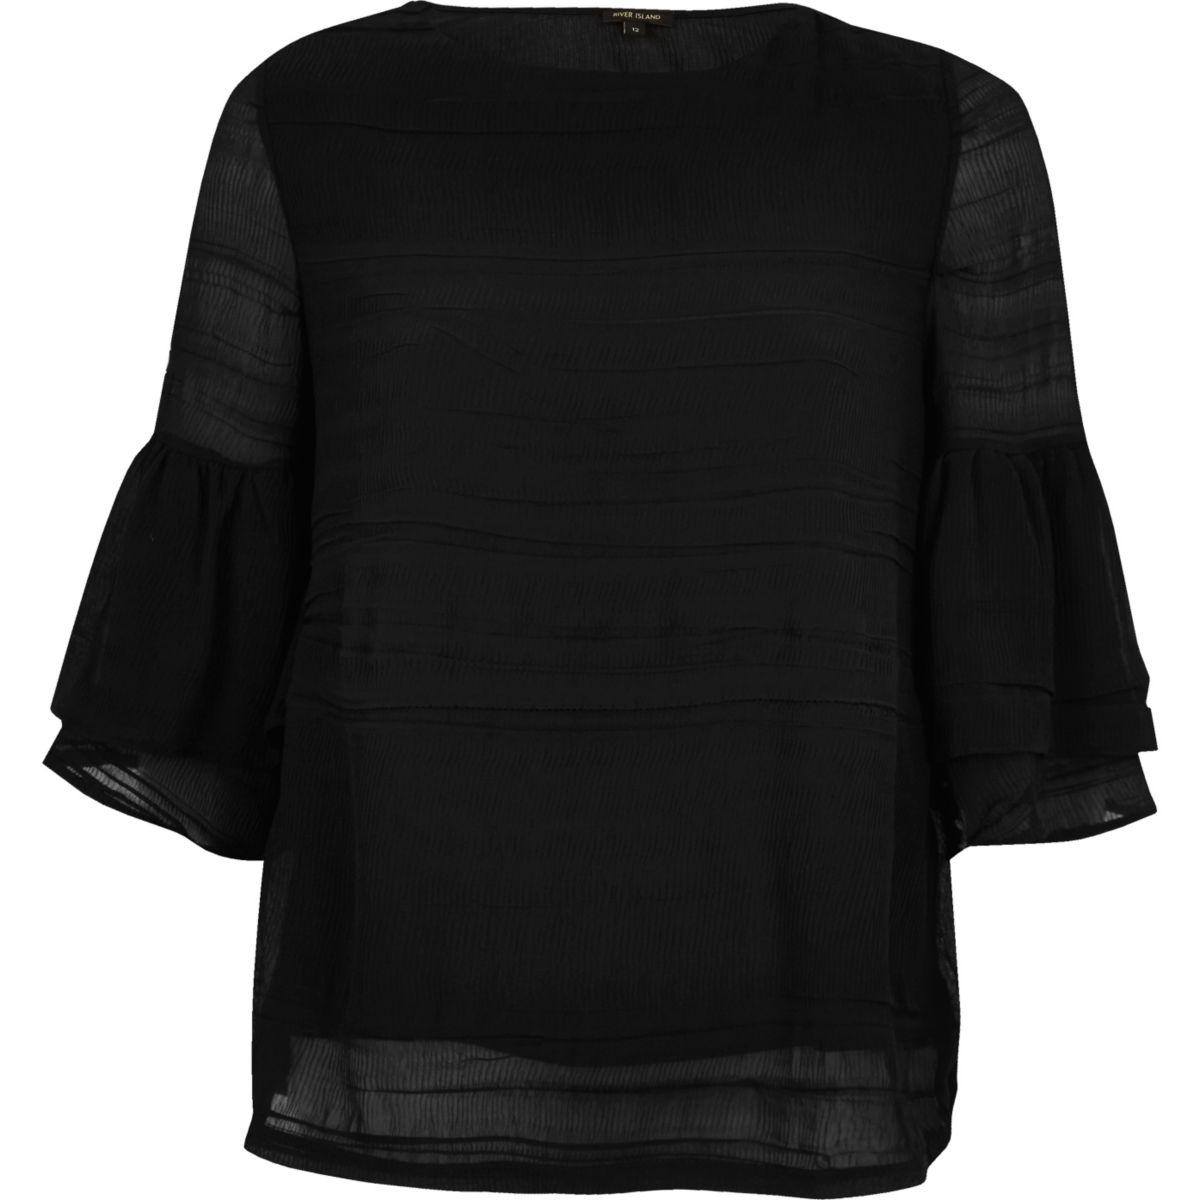 Black layered frill sleeve top